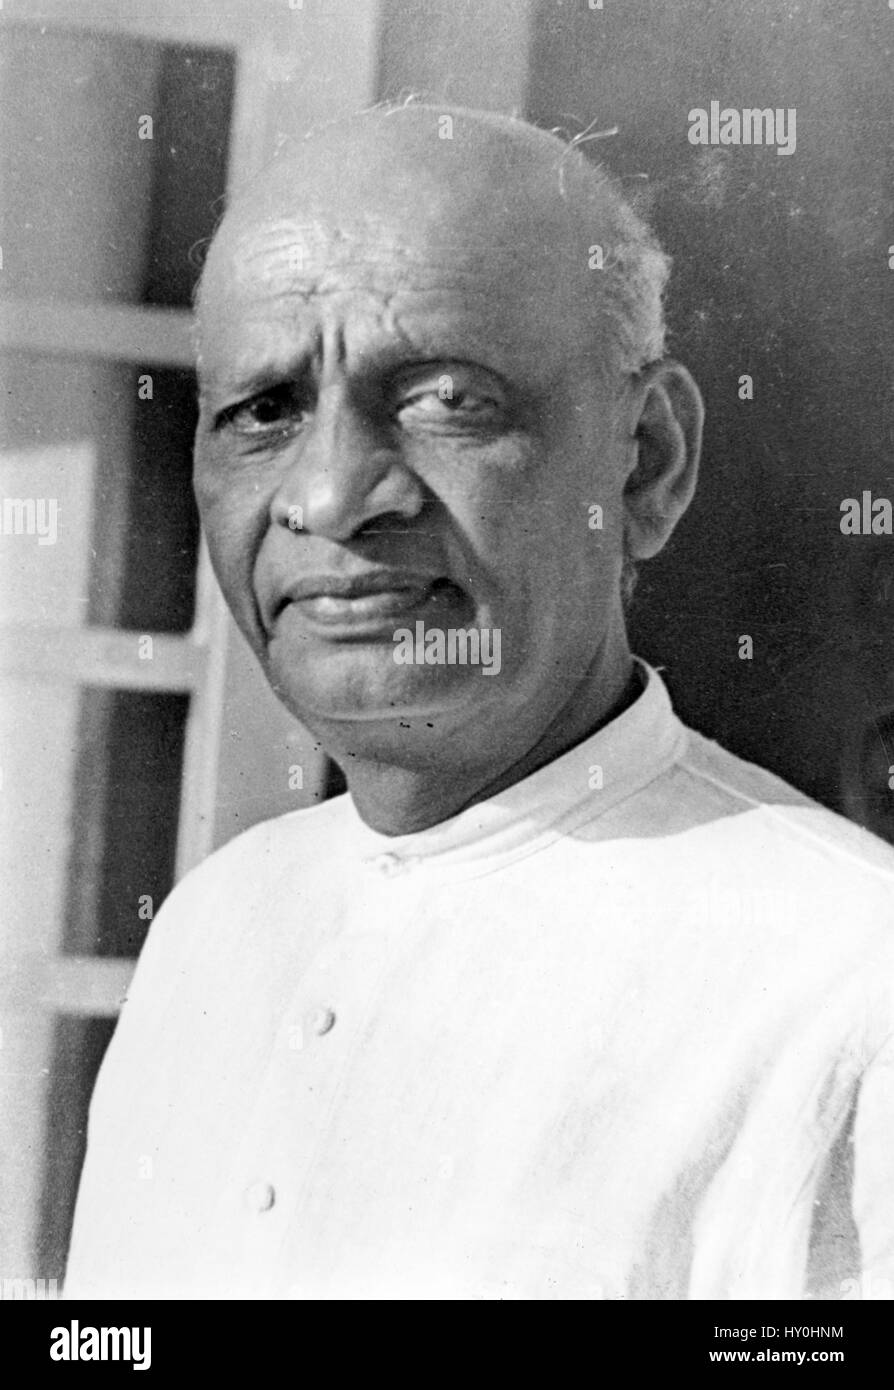 Indian barrister and statesman, sardar vallabhbhai patel, india, asia, 1945 - Stock Image